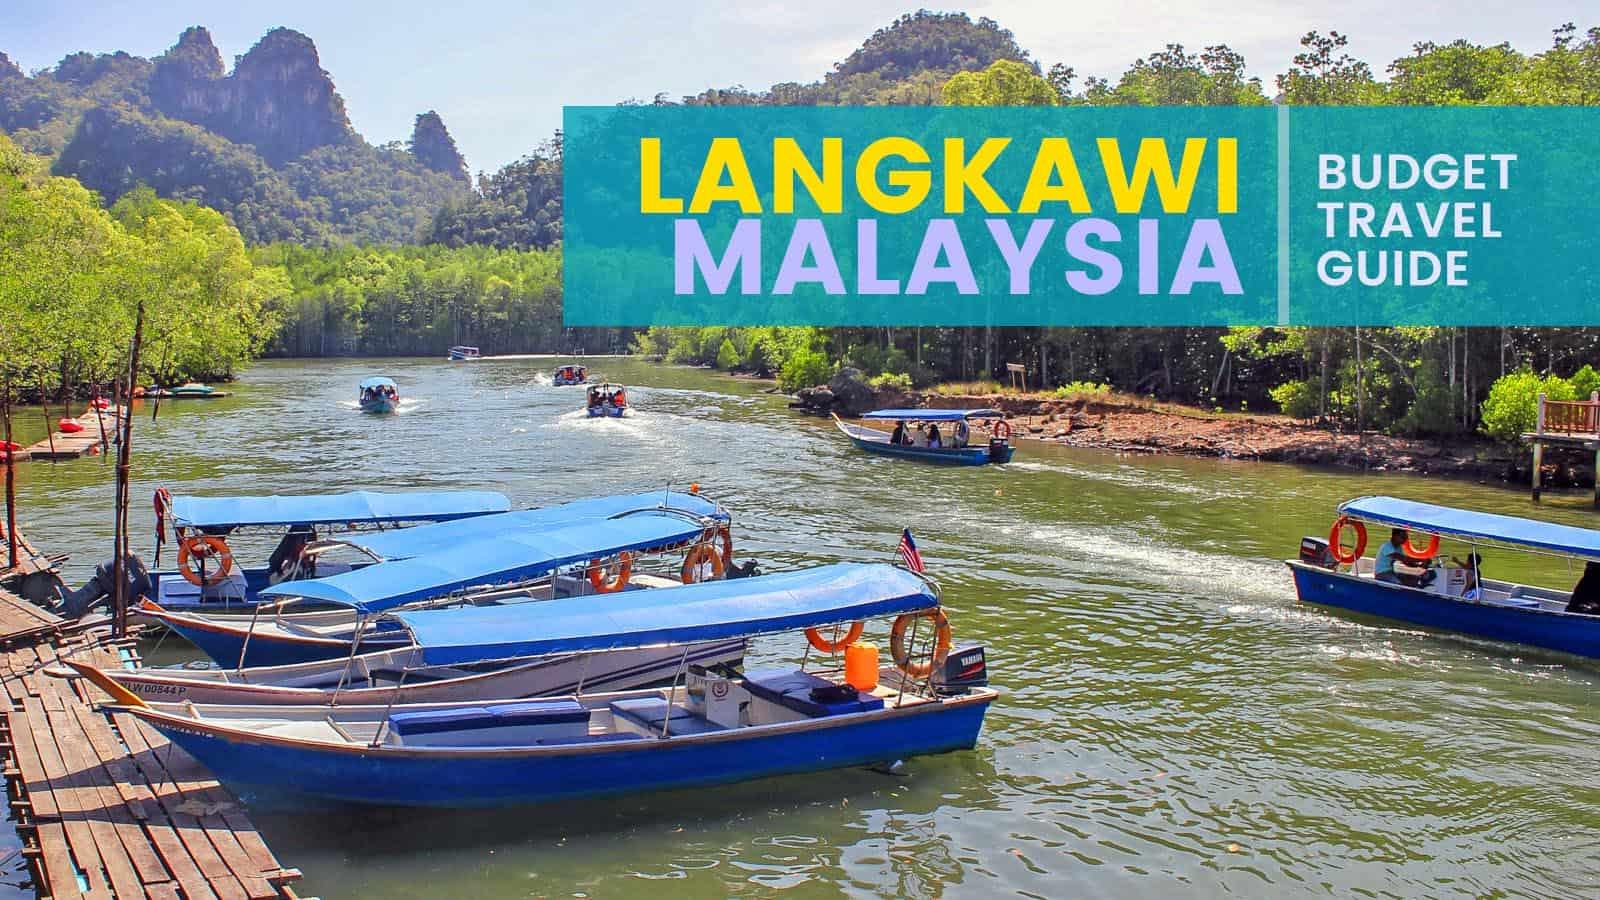 LANGKAWI, MALAYSIA: Budget Travel Guide